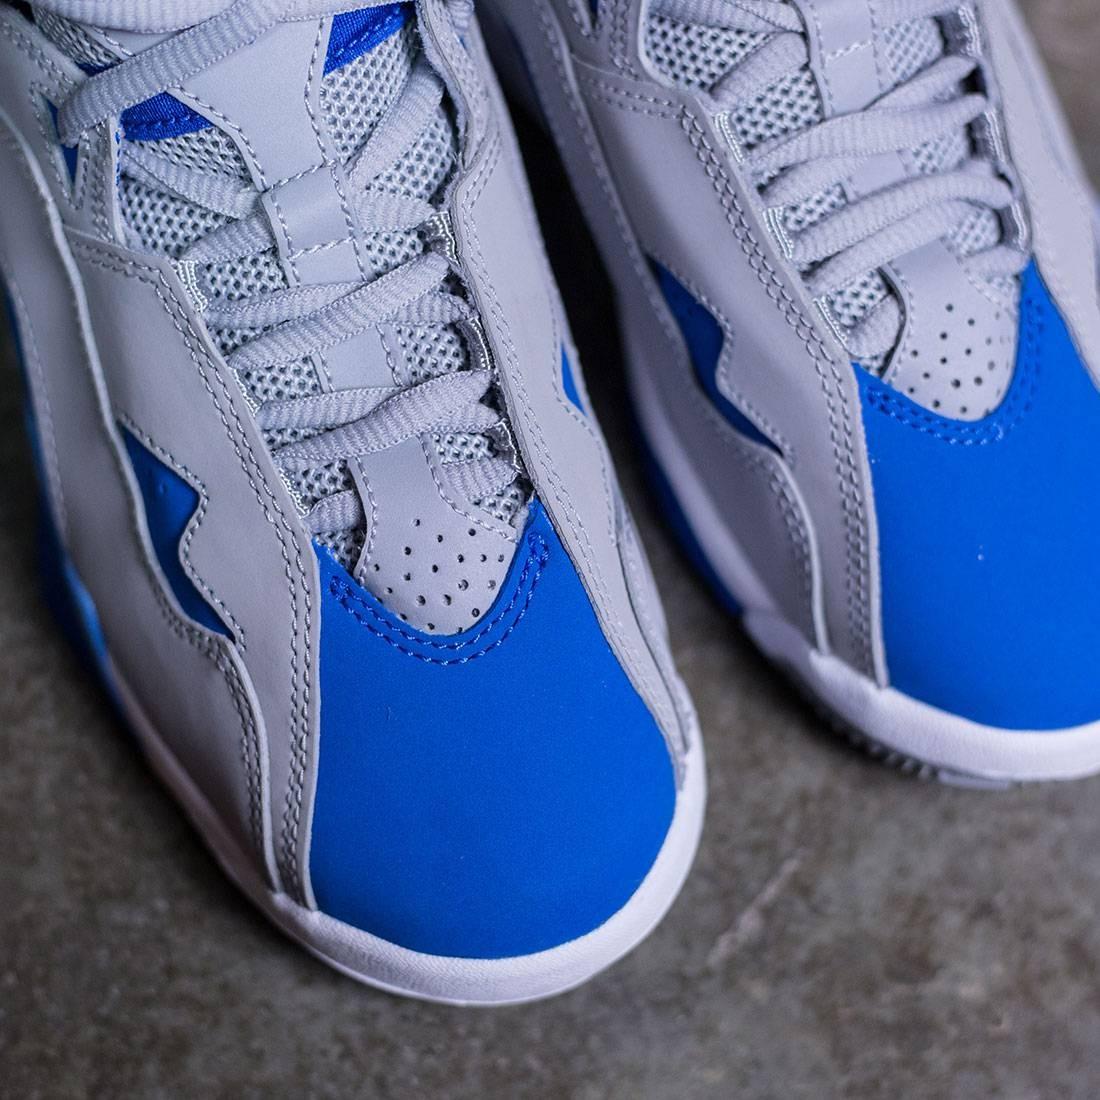 super popular cead4 356f6 ...  343795-005  Air Jordan True Flight Bg Wolf Grey white blue Jordan Big  Kids True Flight (GS) (wolf grey   white-blue spark ...